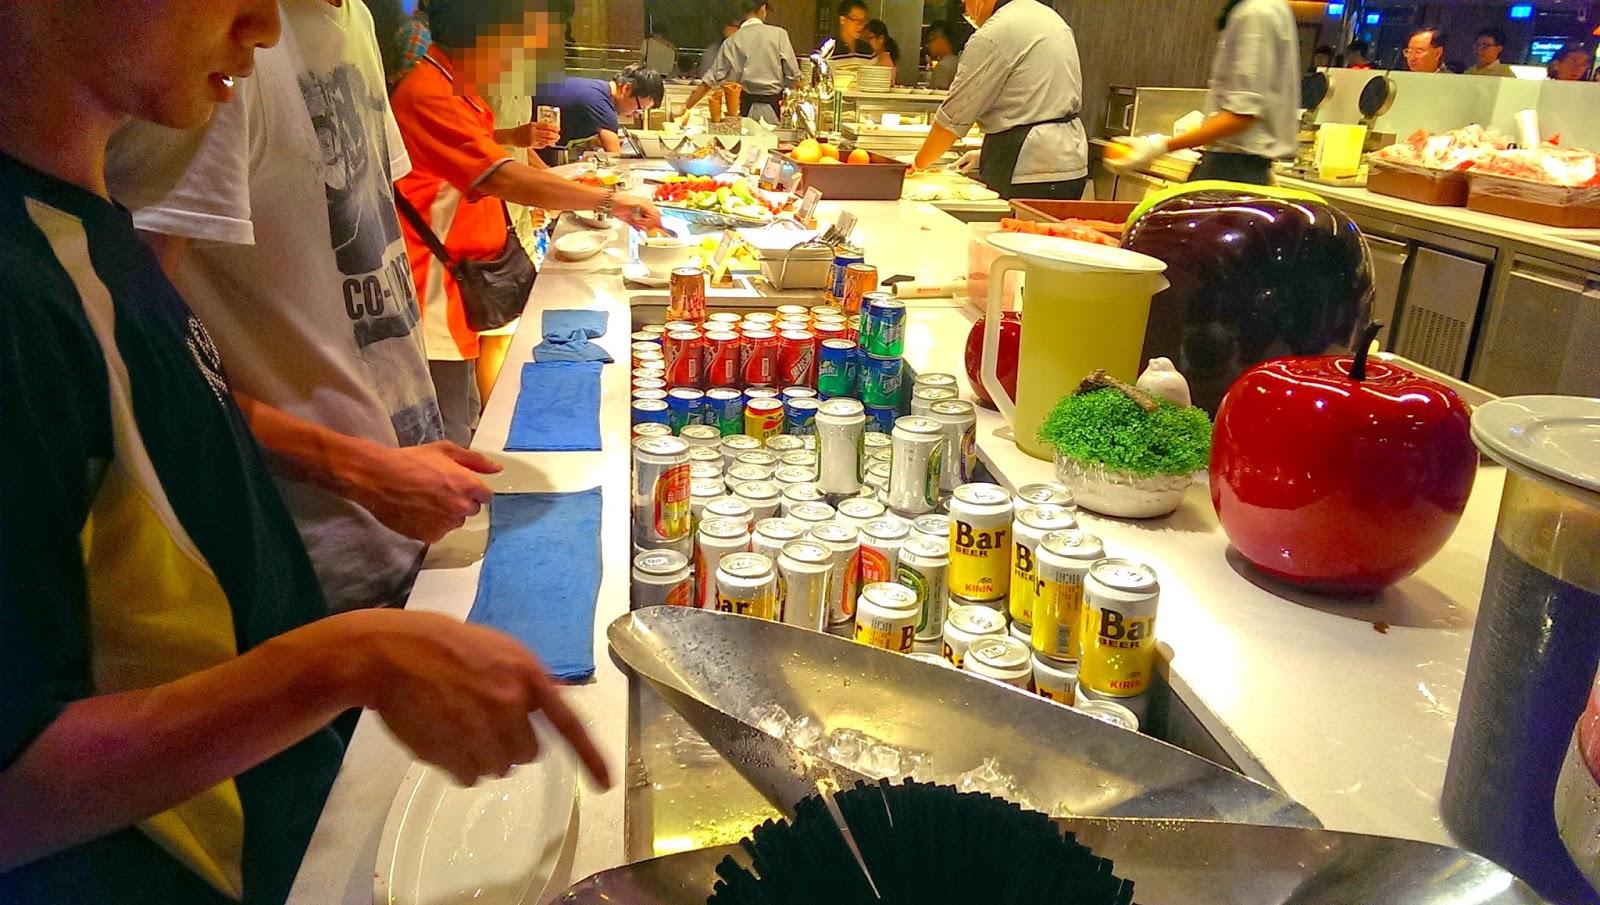 2015 07 01%2B19.18.19 - [食記] 台北京站 - 饗食天堂,有生魚片吃到飽的高級自助餐廳!